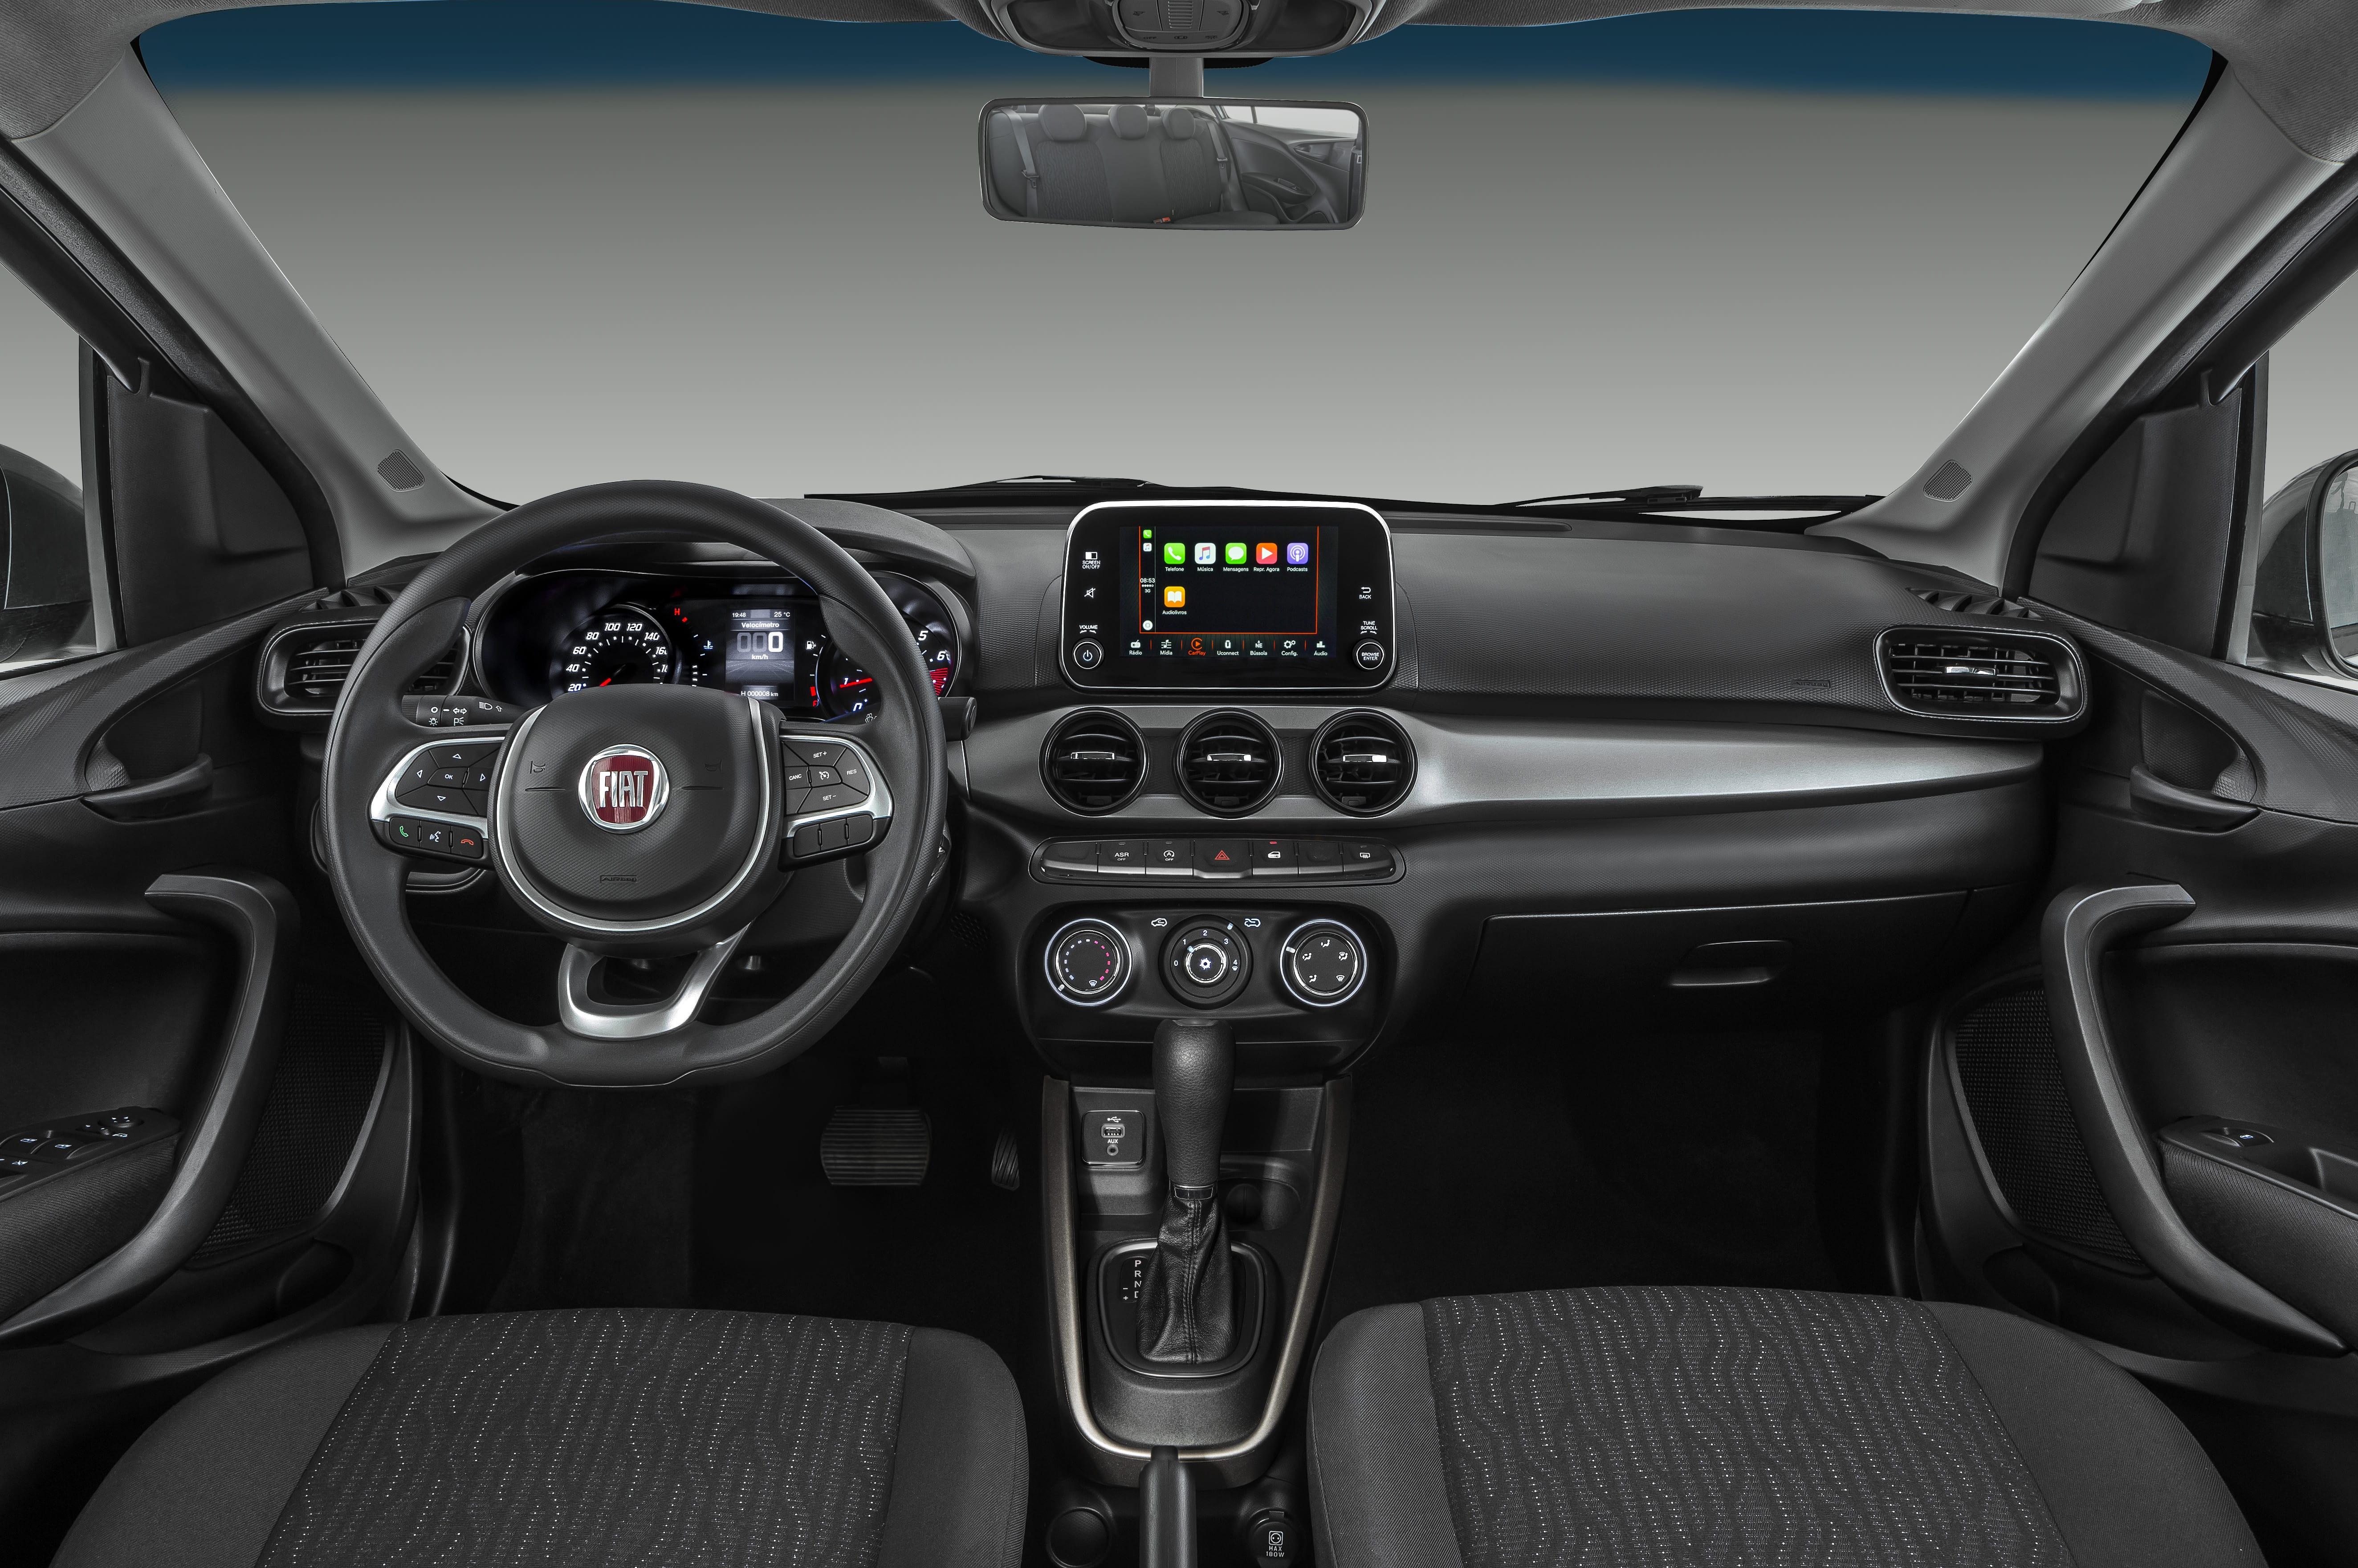 Fiat Cronos Drive 1.8 AT